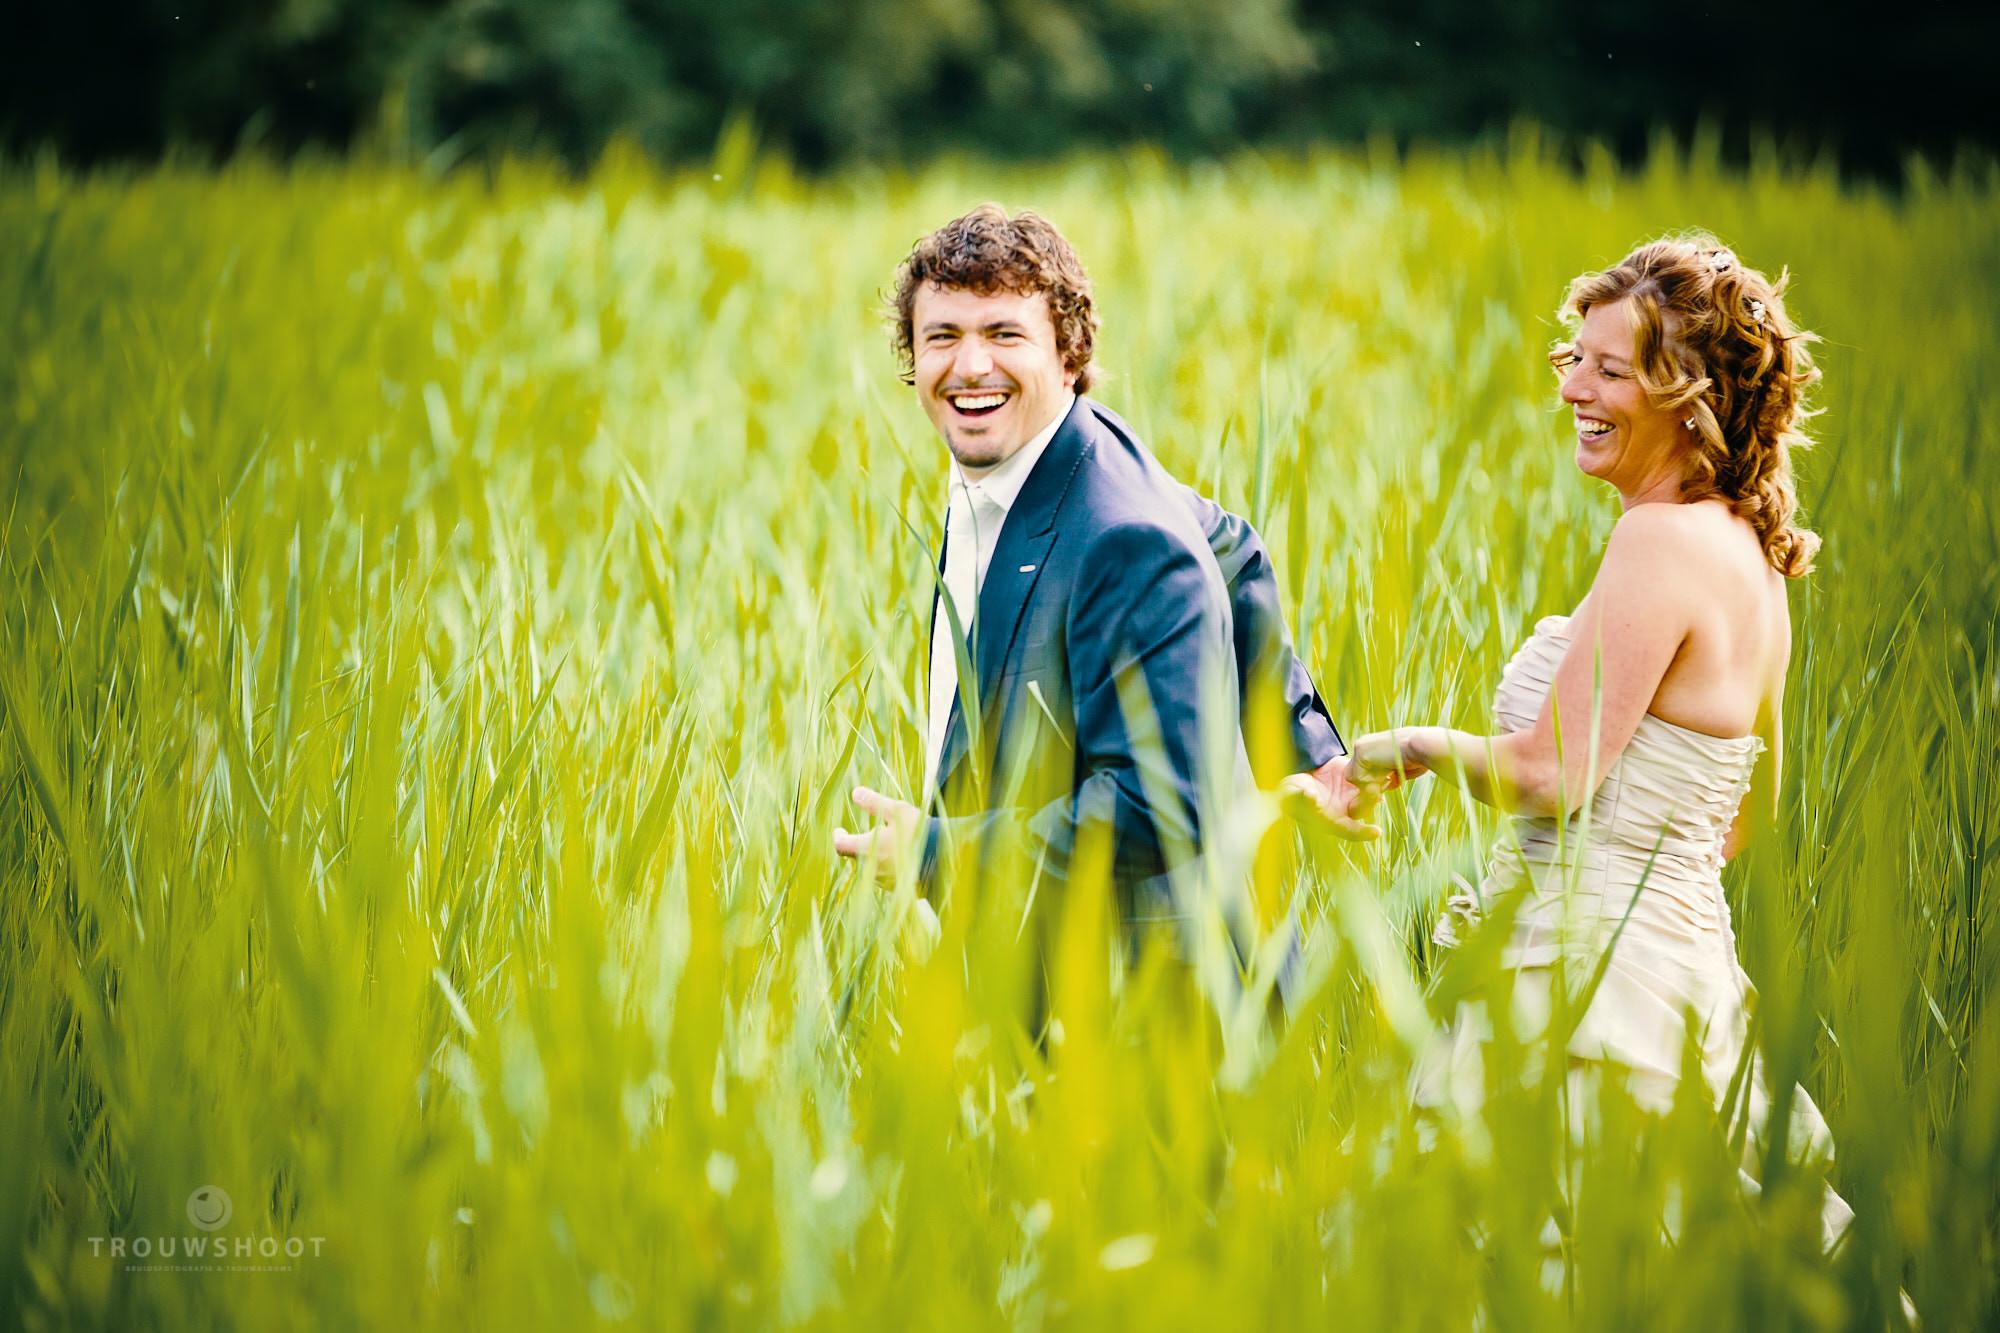 trouwshoot_bruidsfotografie_trouwfoto_185.jpg